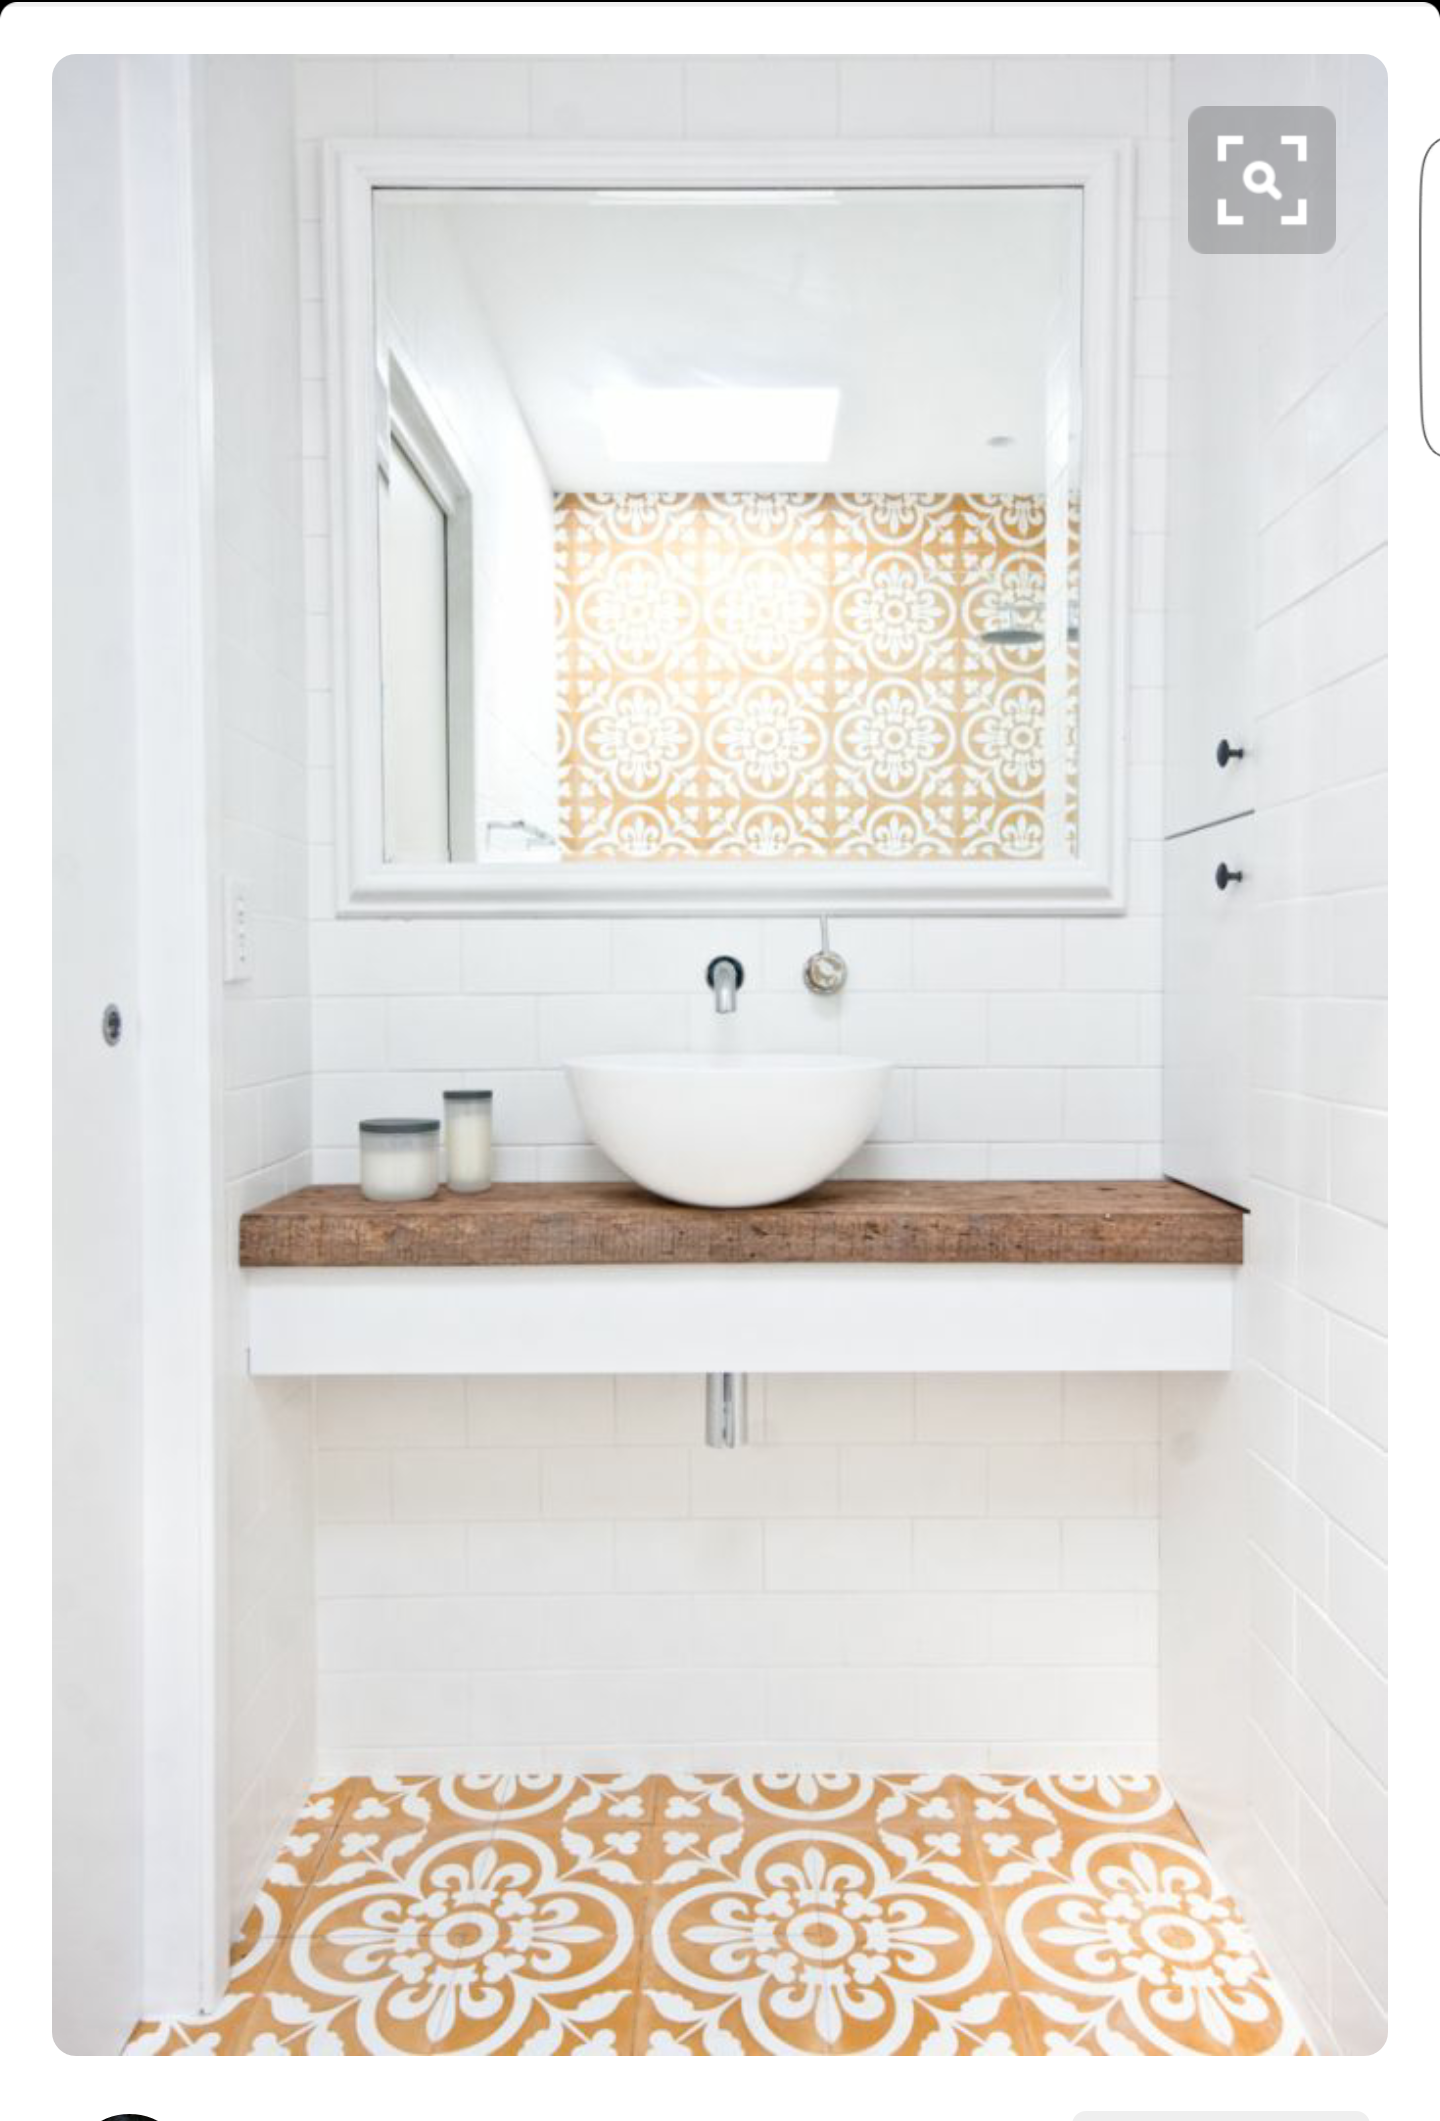 Pin by Ivana Petrović on Tiles - Bathroom / Kitchen | Pinterest ...